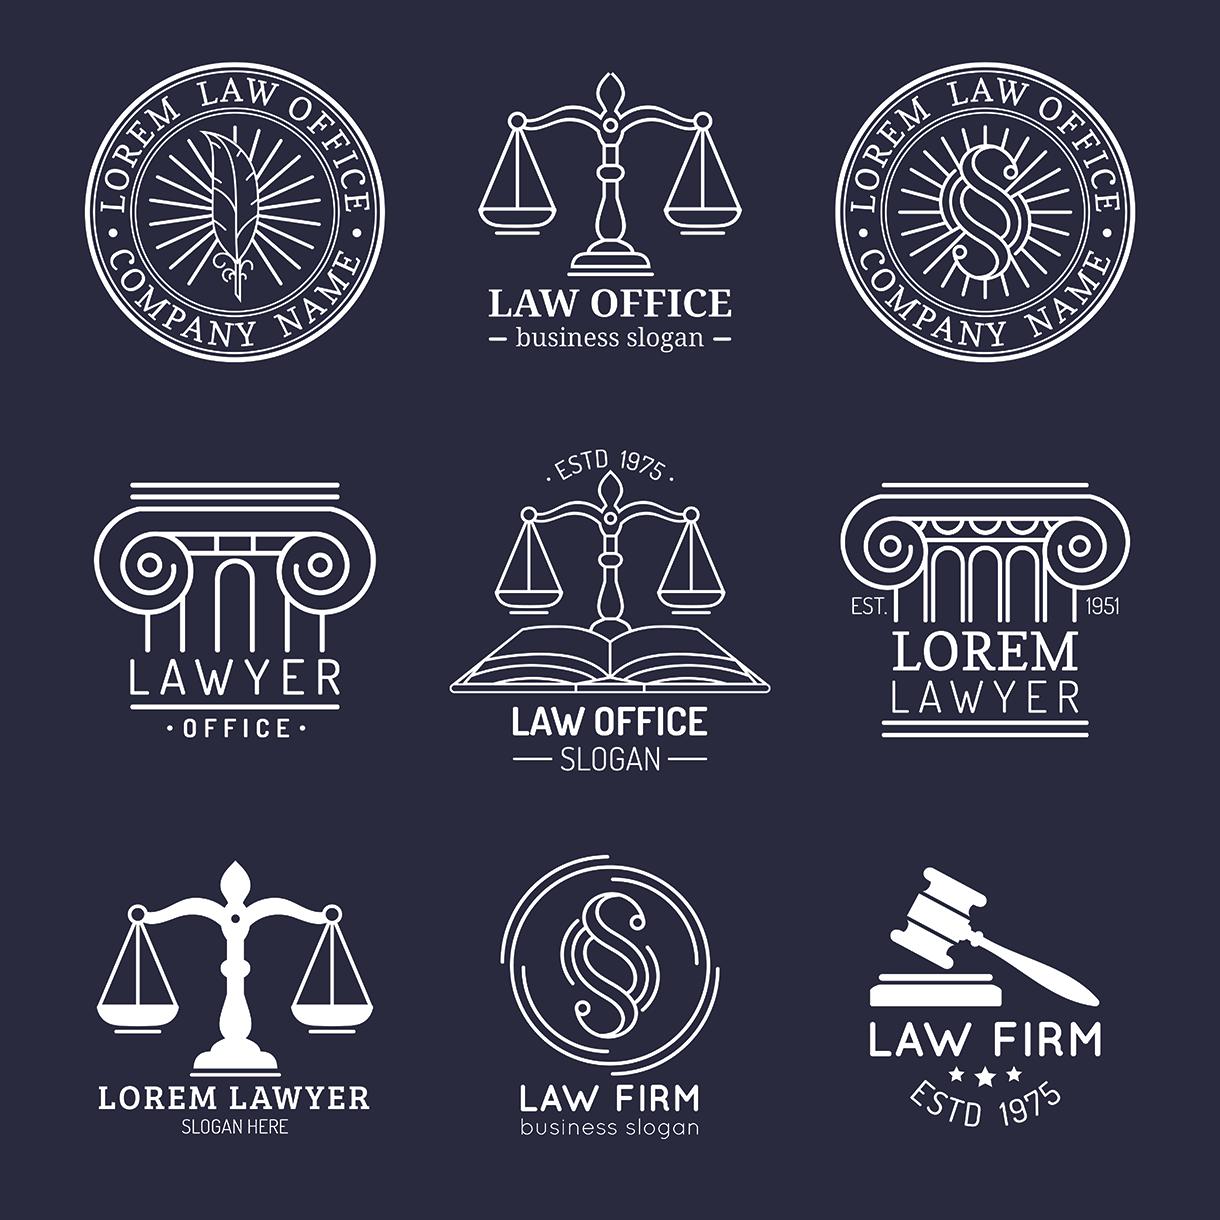 generic-law-logos